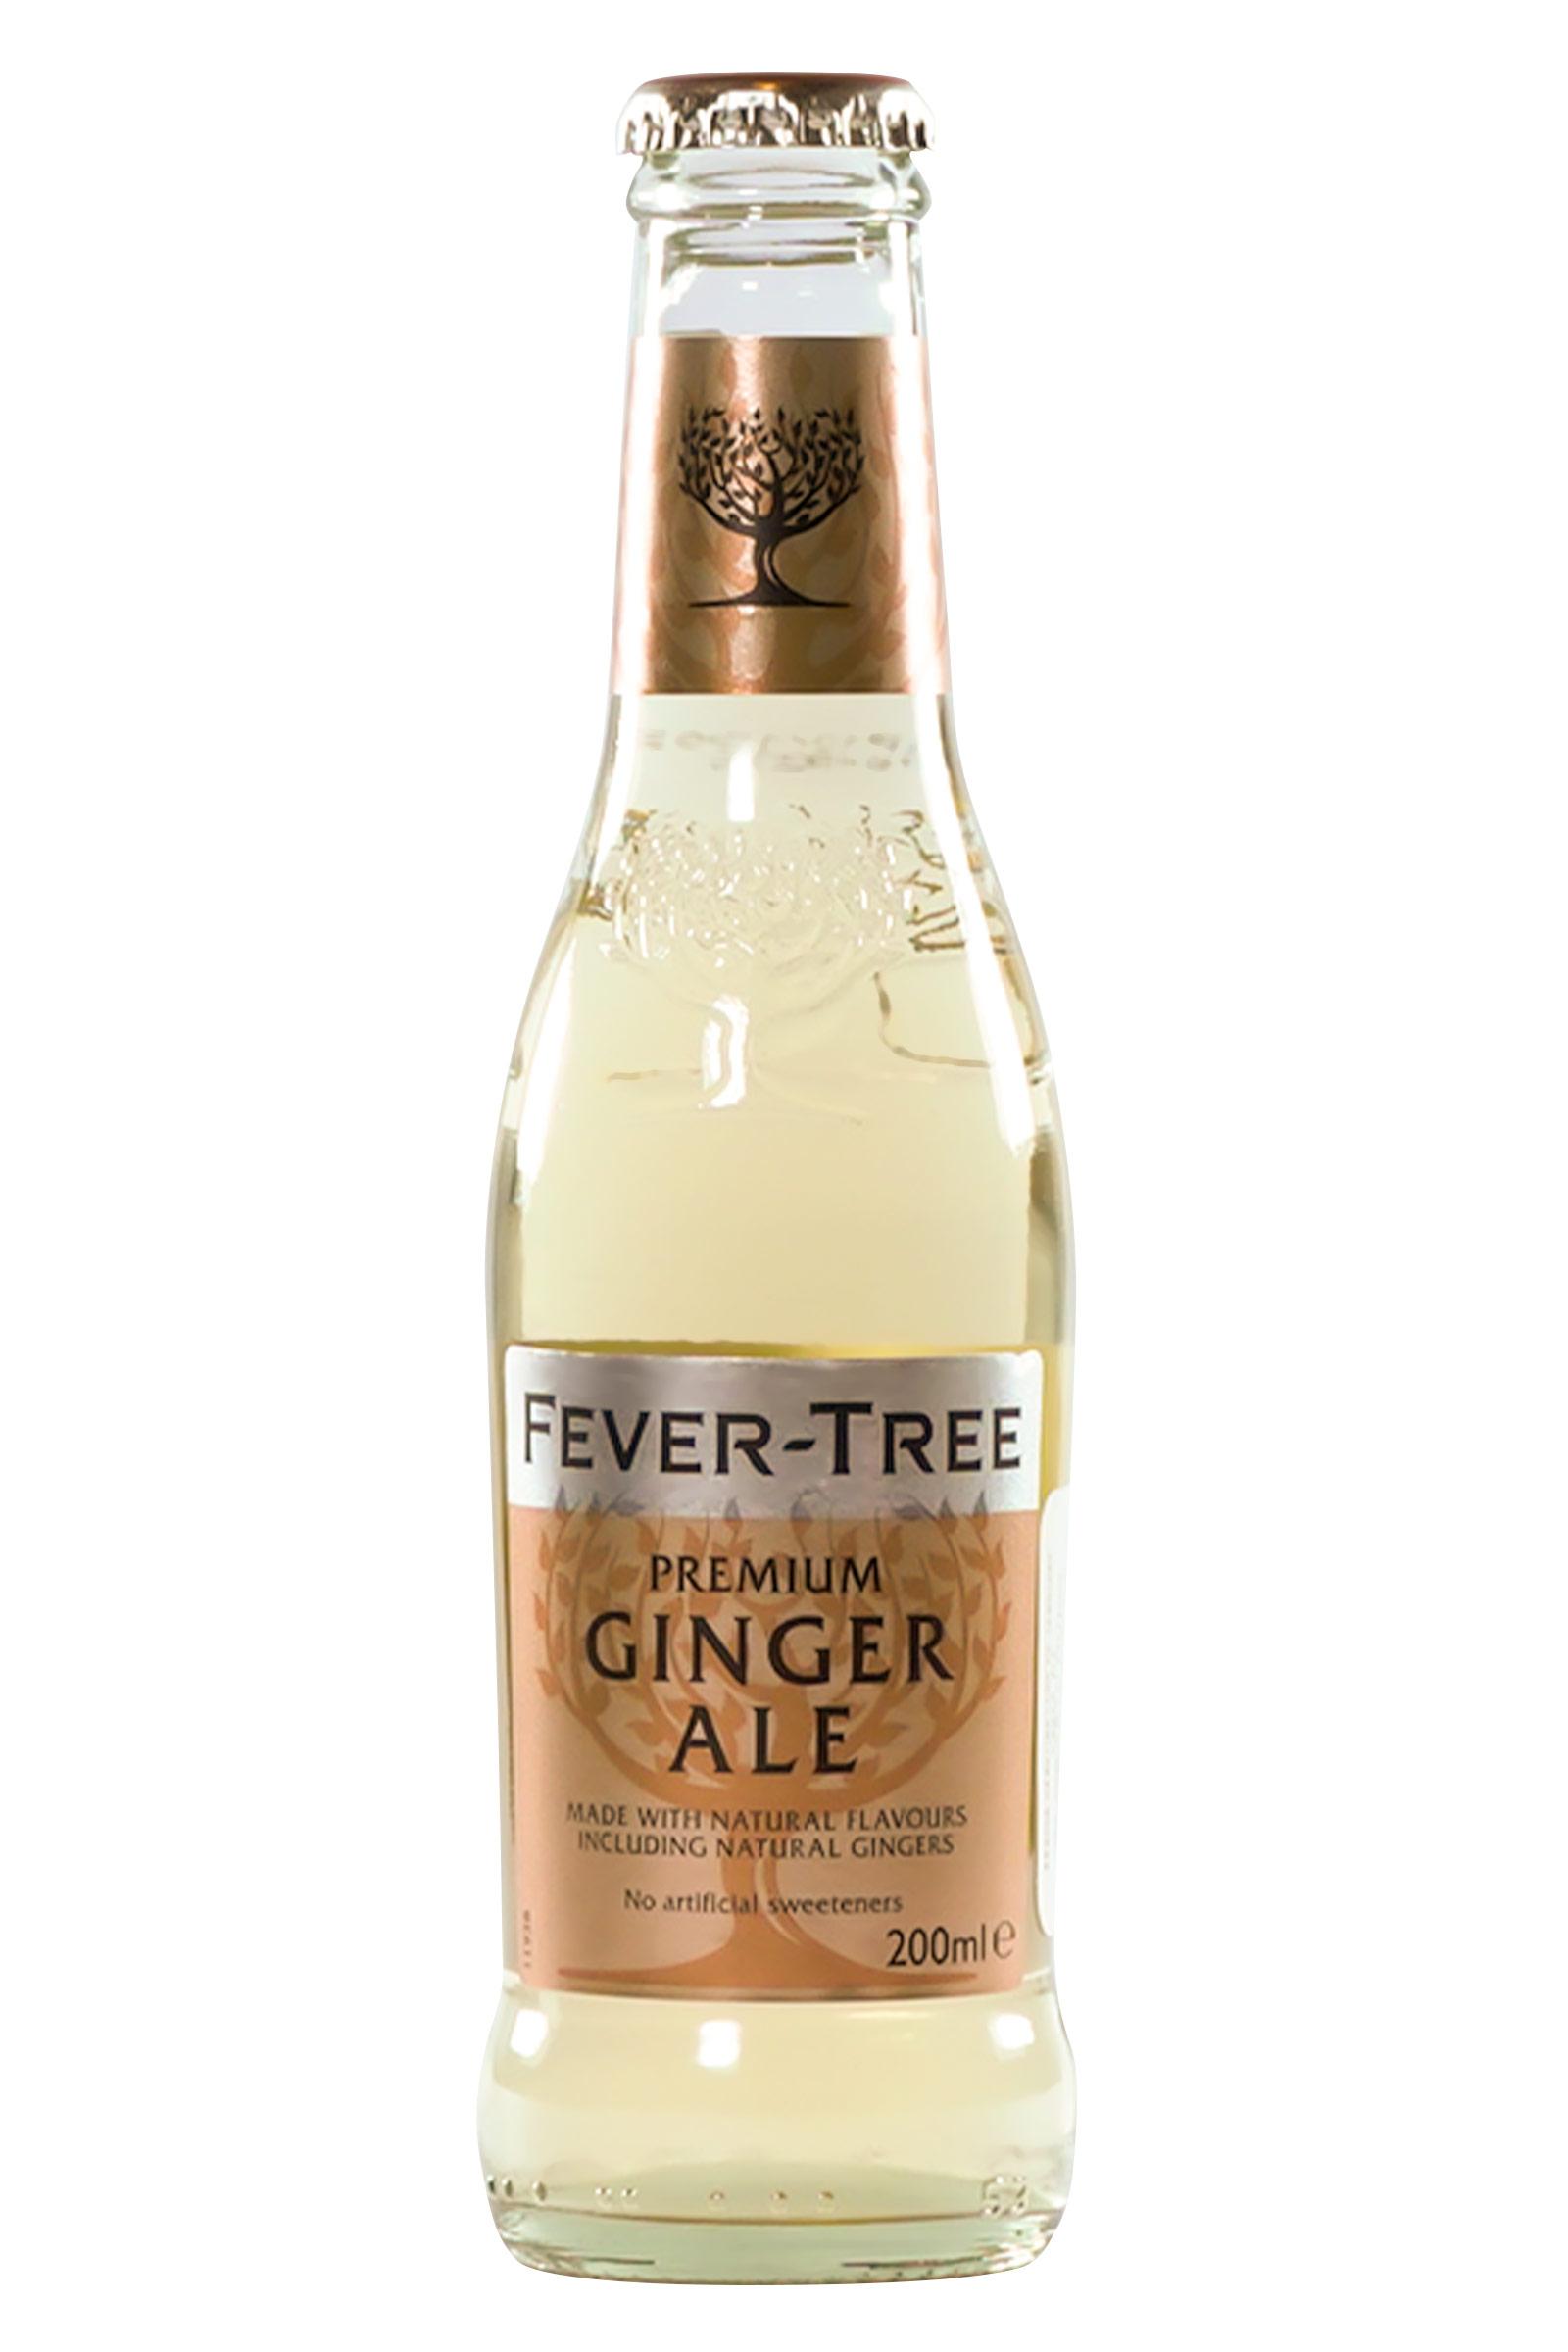 Fever-Tree Ginger Ale 200ml